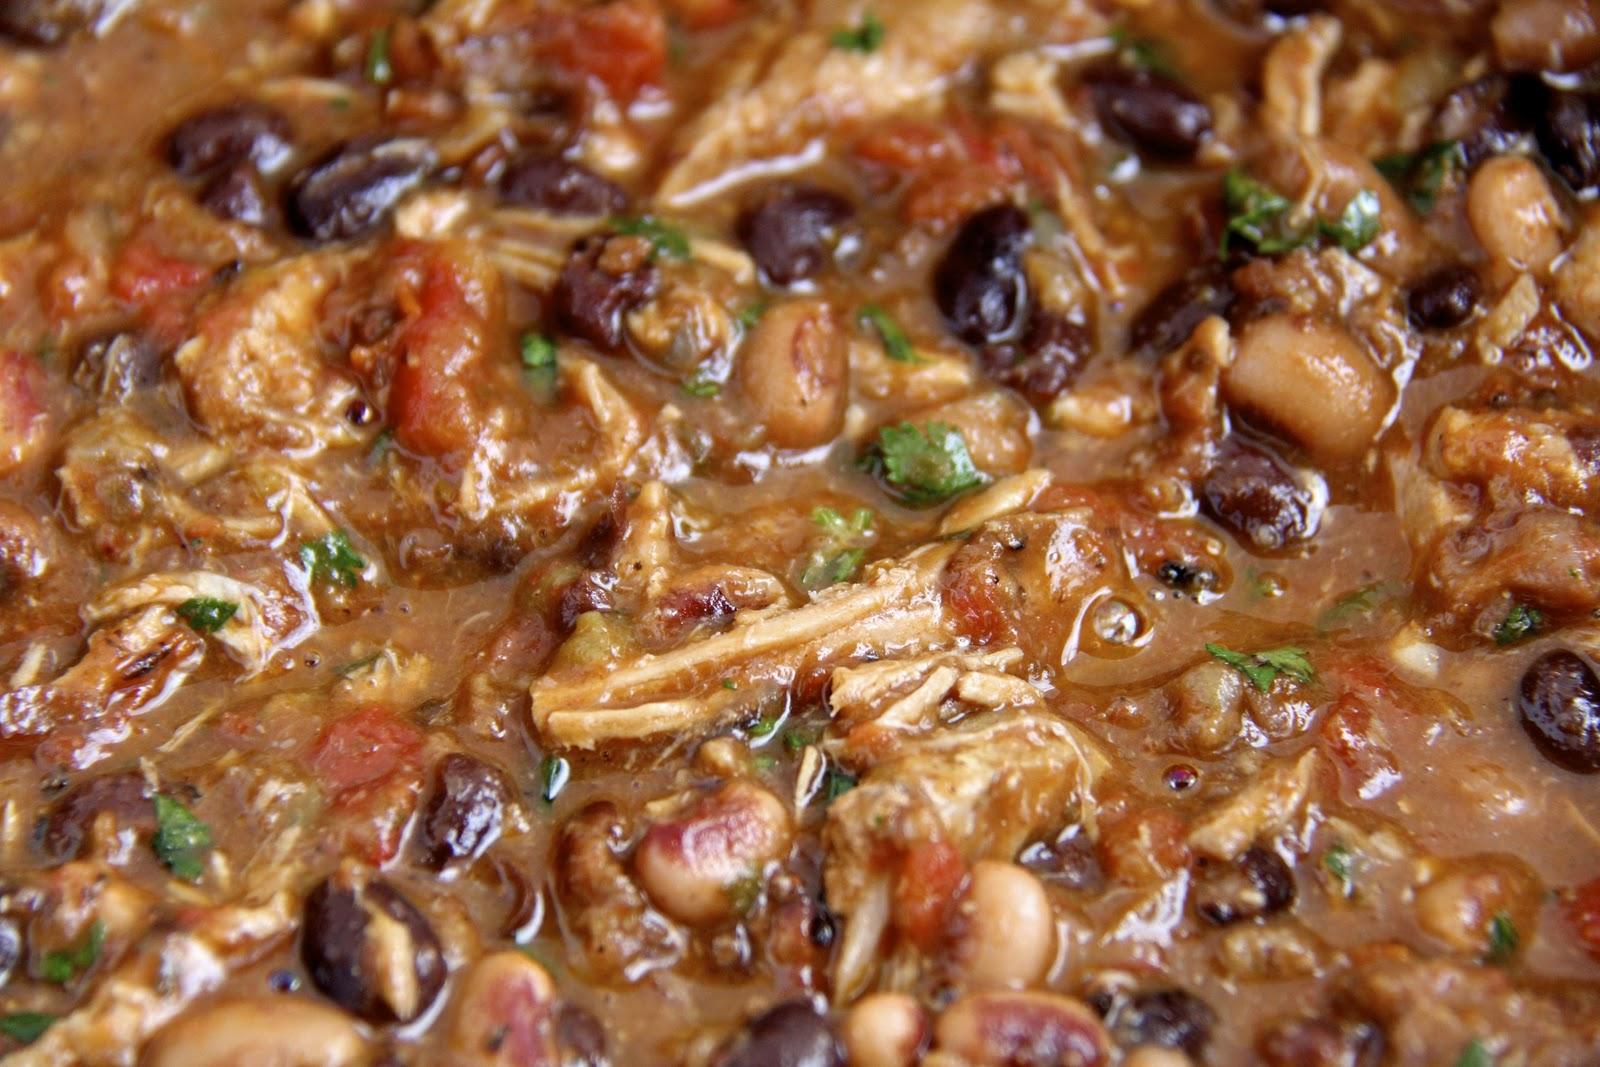 Pork and Chorizo Chili w/ Black Beans and Black-eyed